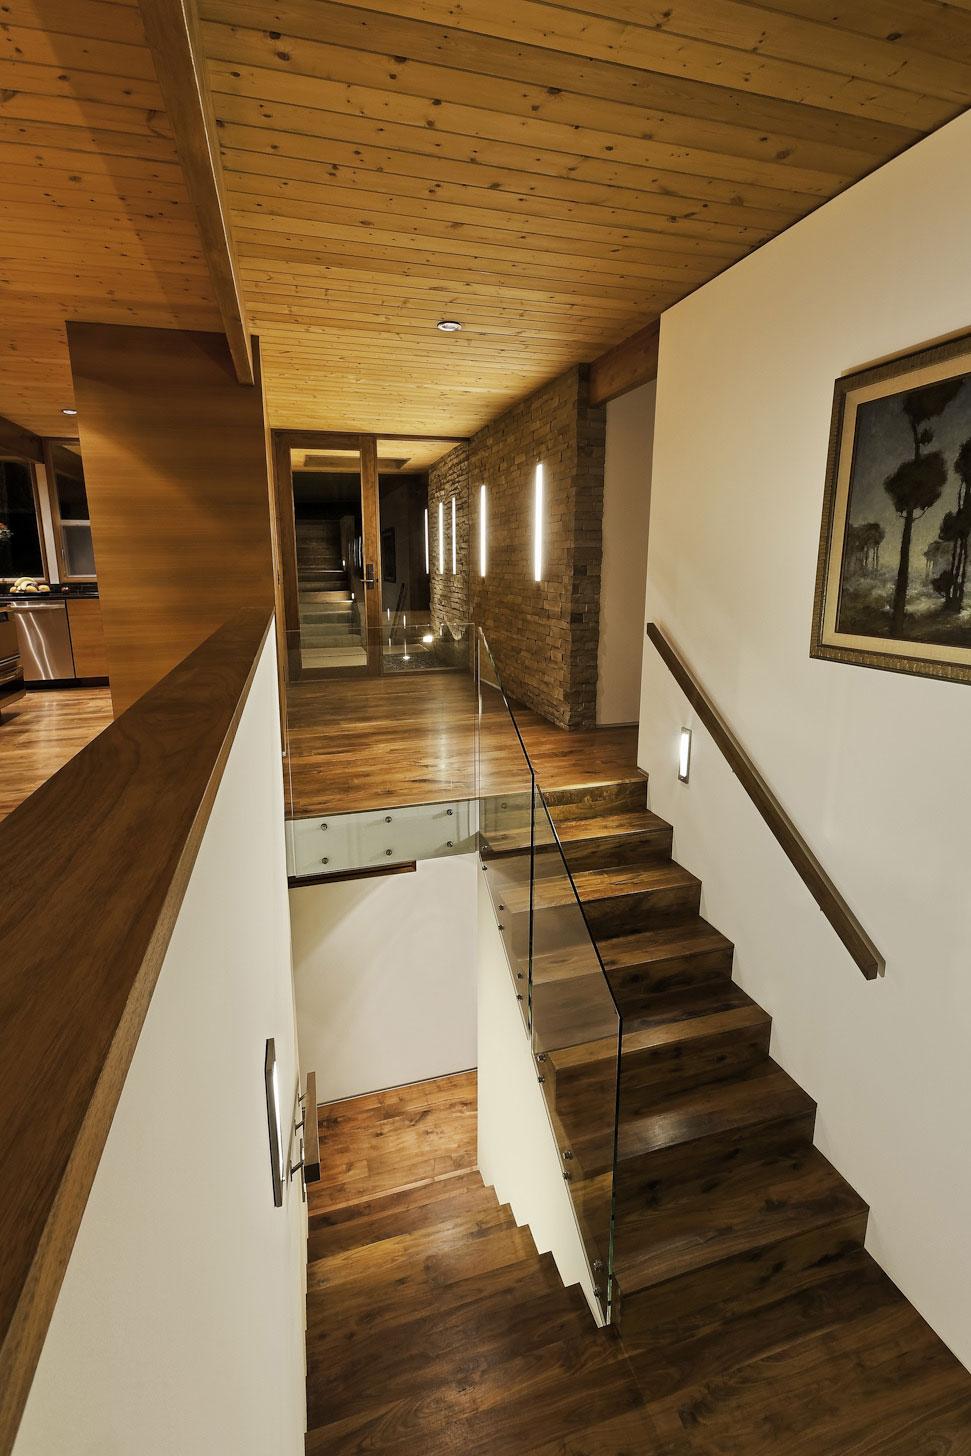 Wooden & Glass Stairs, Mid-Century Modern Home in Santa Barbara, California